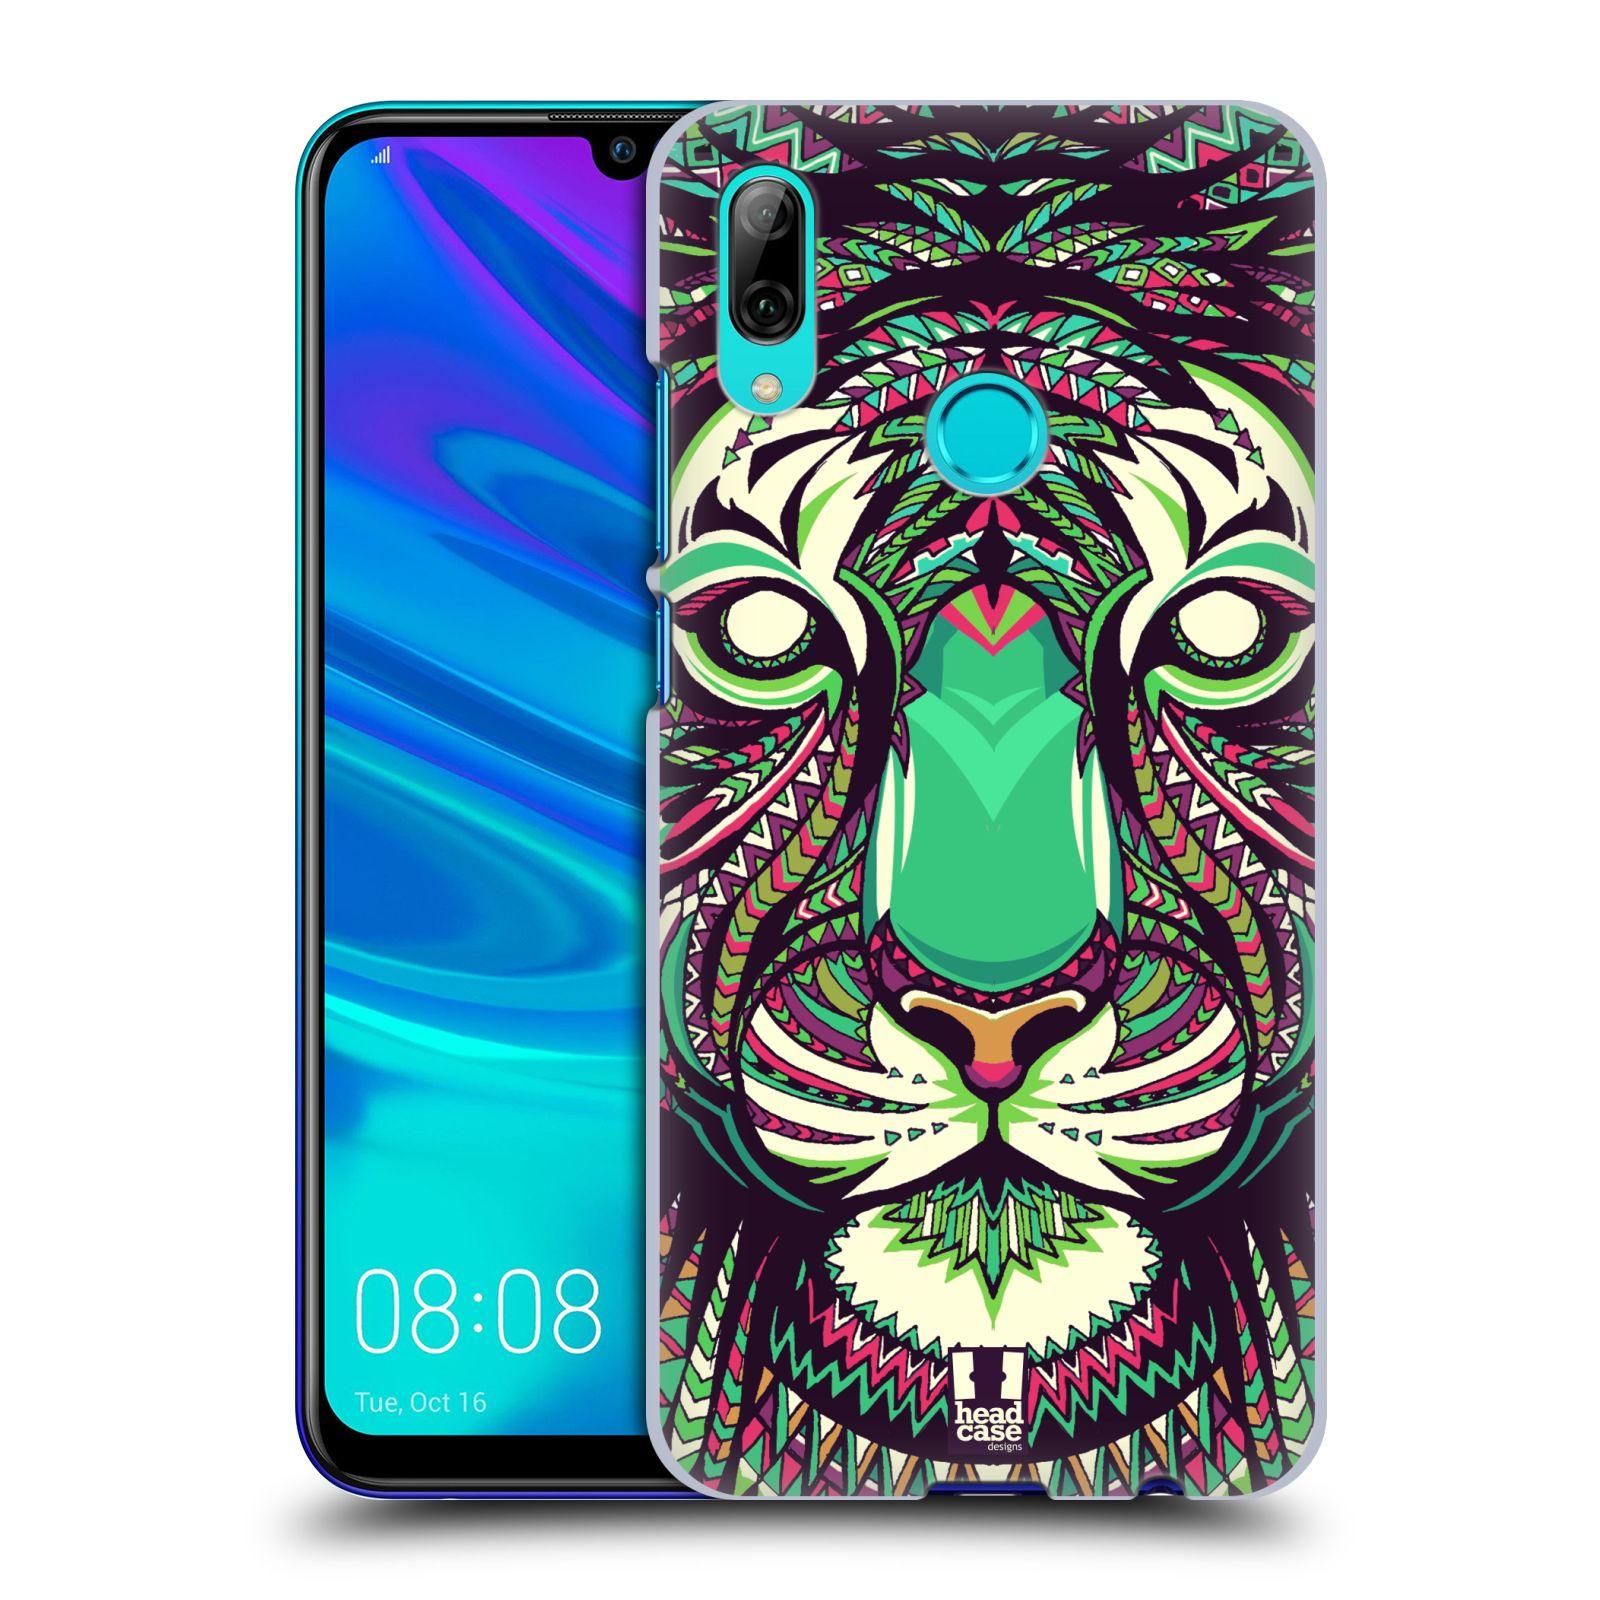 Plastové pouzdro na mobil Huawei P Smart (2019) - Head Case - AZTEC TYGR